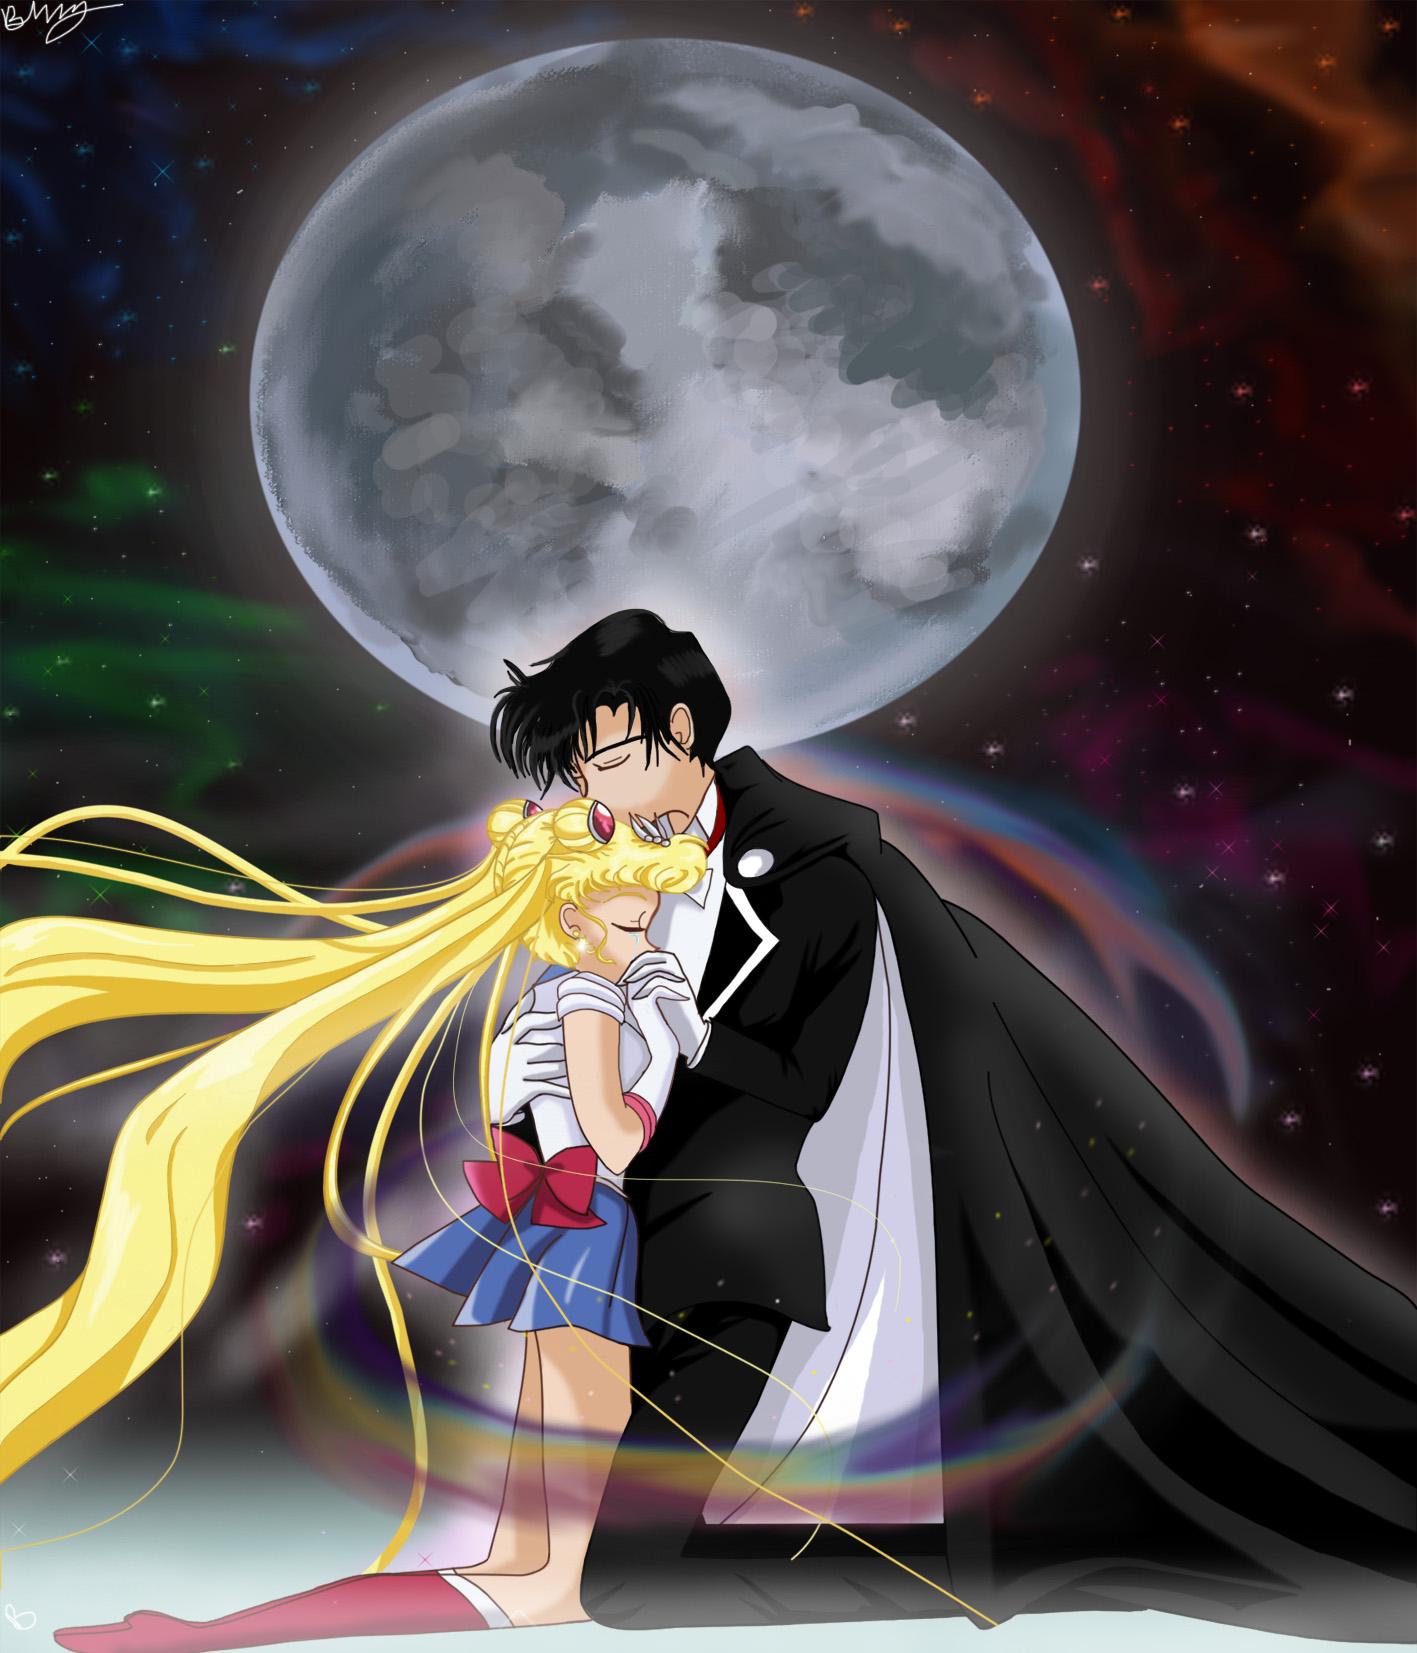 Sailor Moon X Tuxedo Mask: Sailor Moon And Tuxedo Mask By Sailormuffin On DeviantART